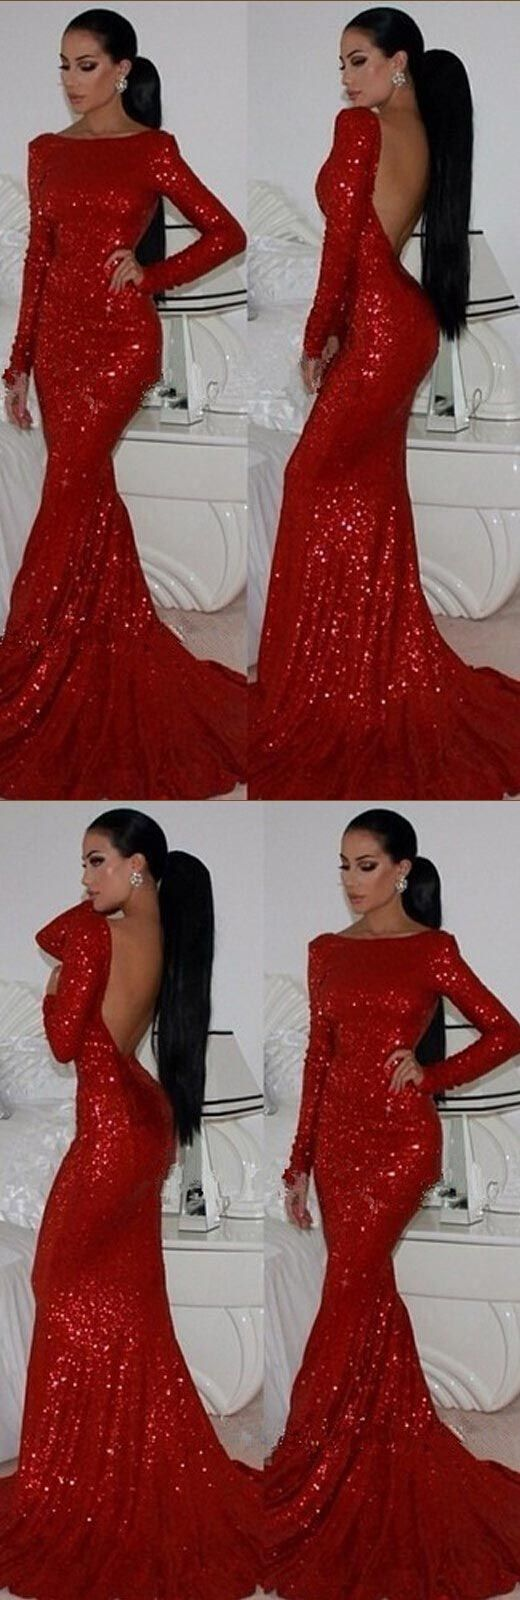 sexy prom dress, backless prom dress, full sleeve prom dress